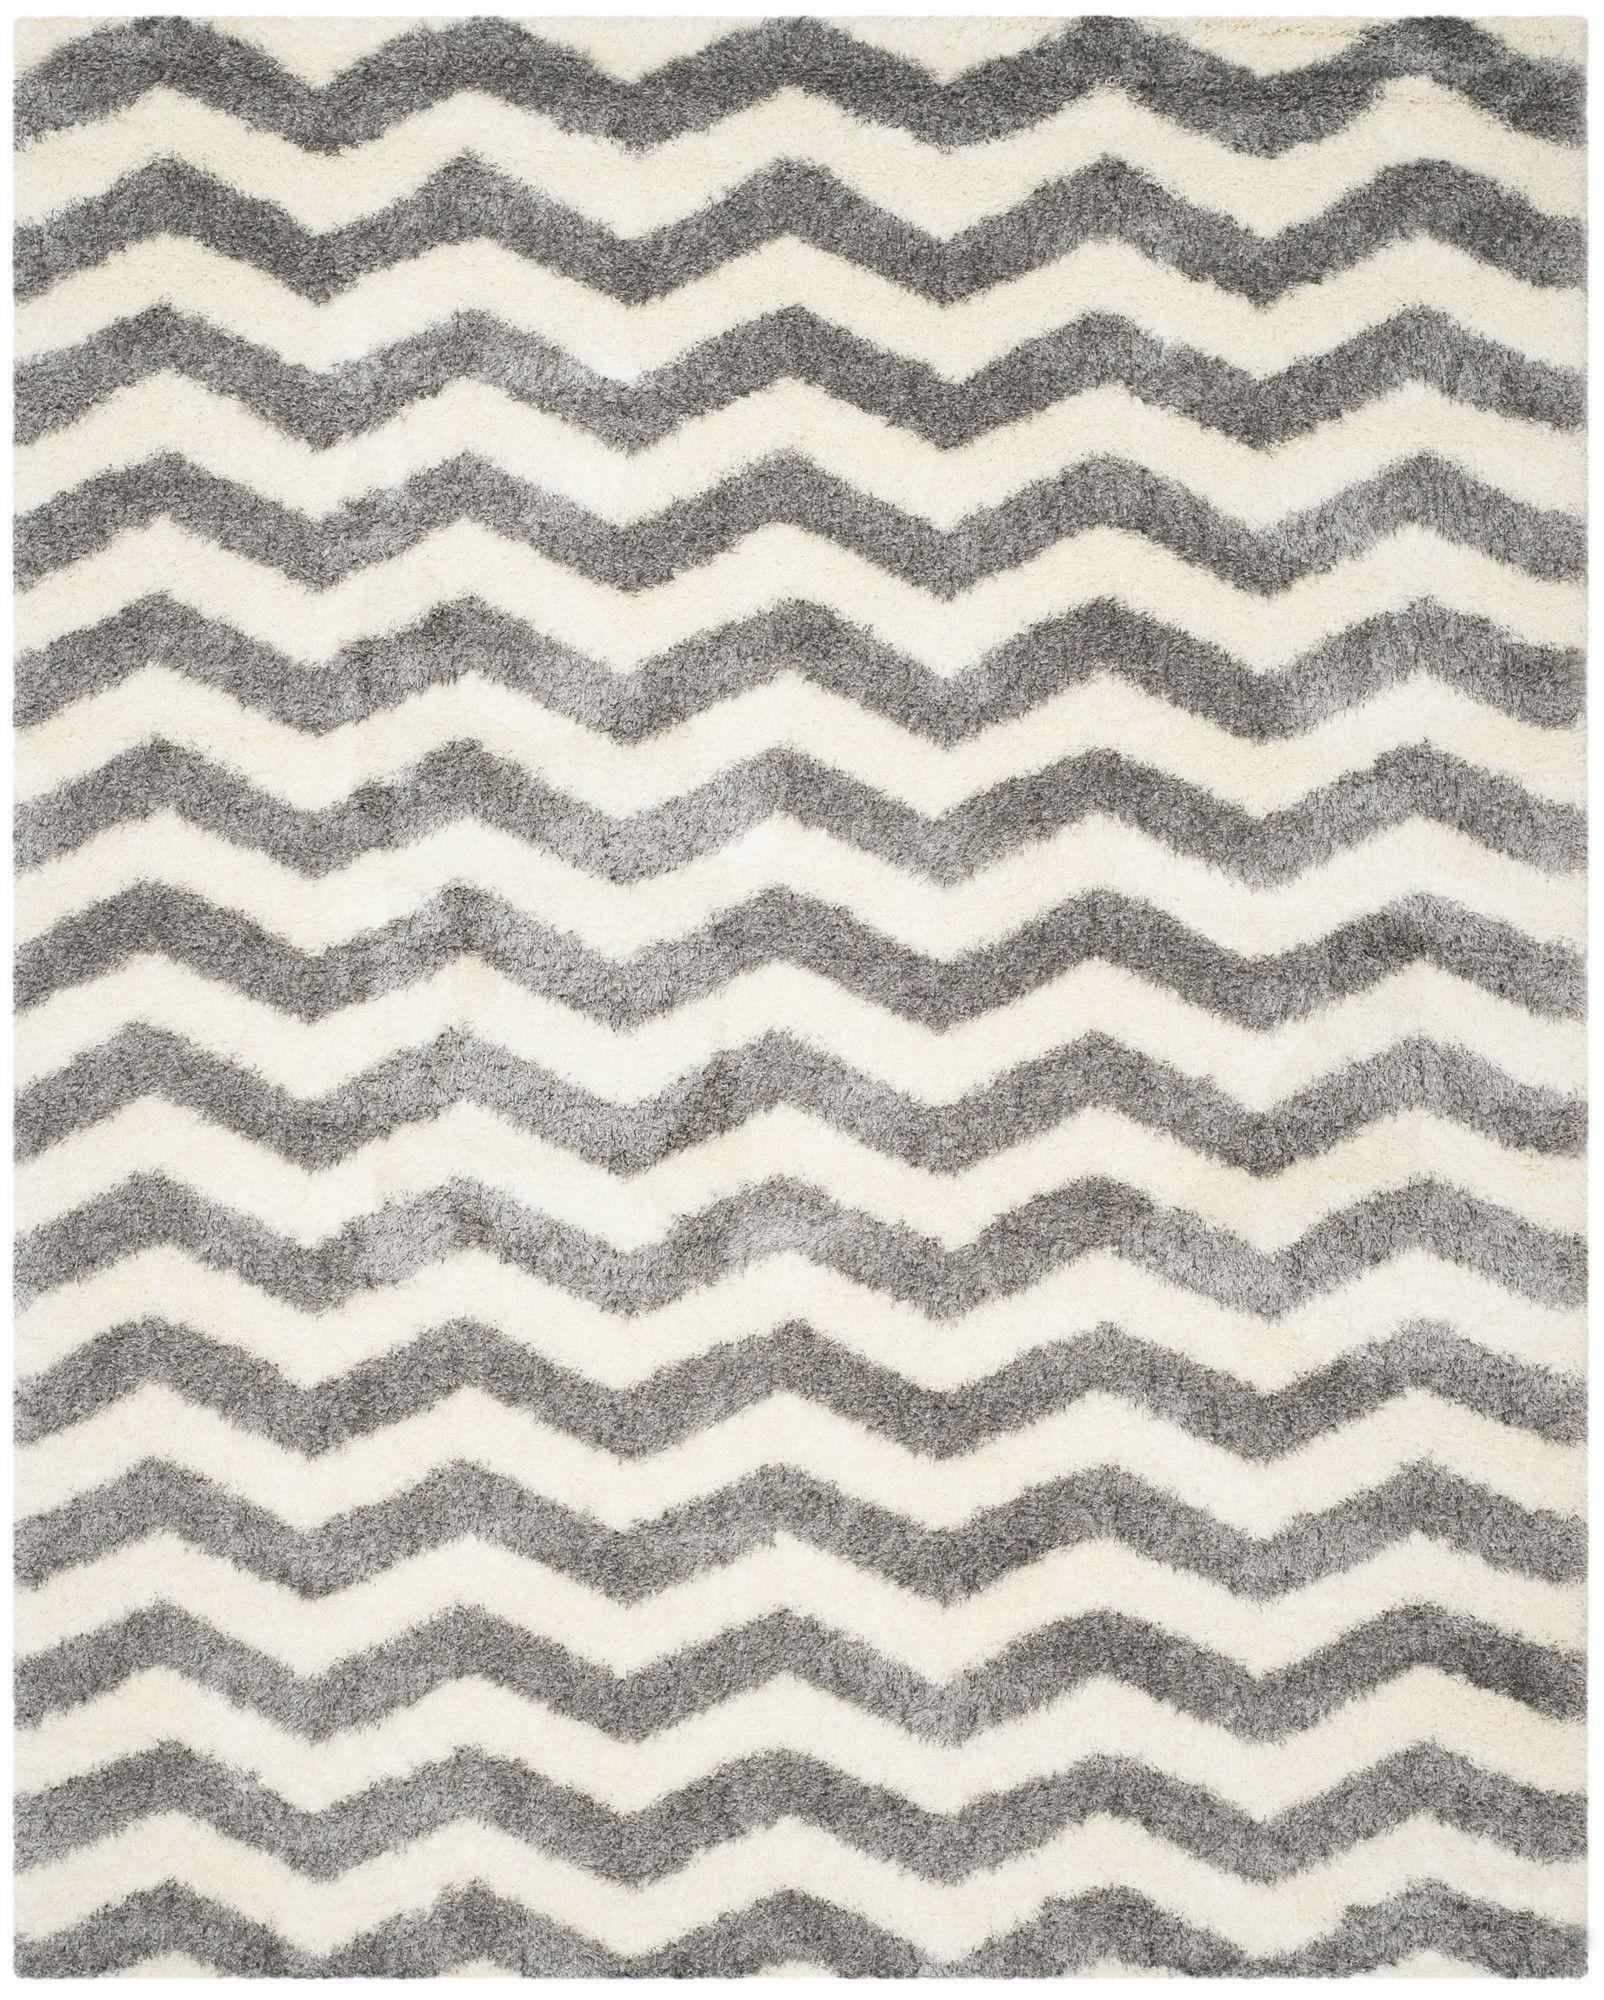 Dalley Ivory/Gray Shag Area Rug